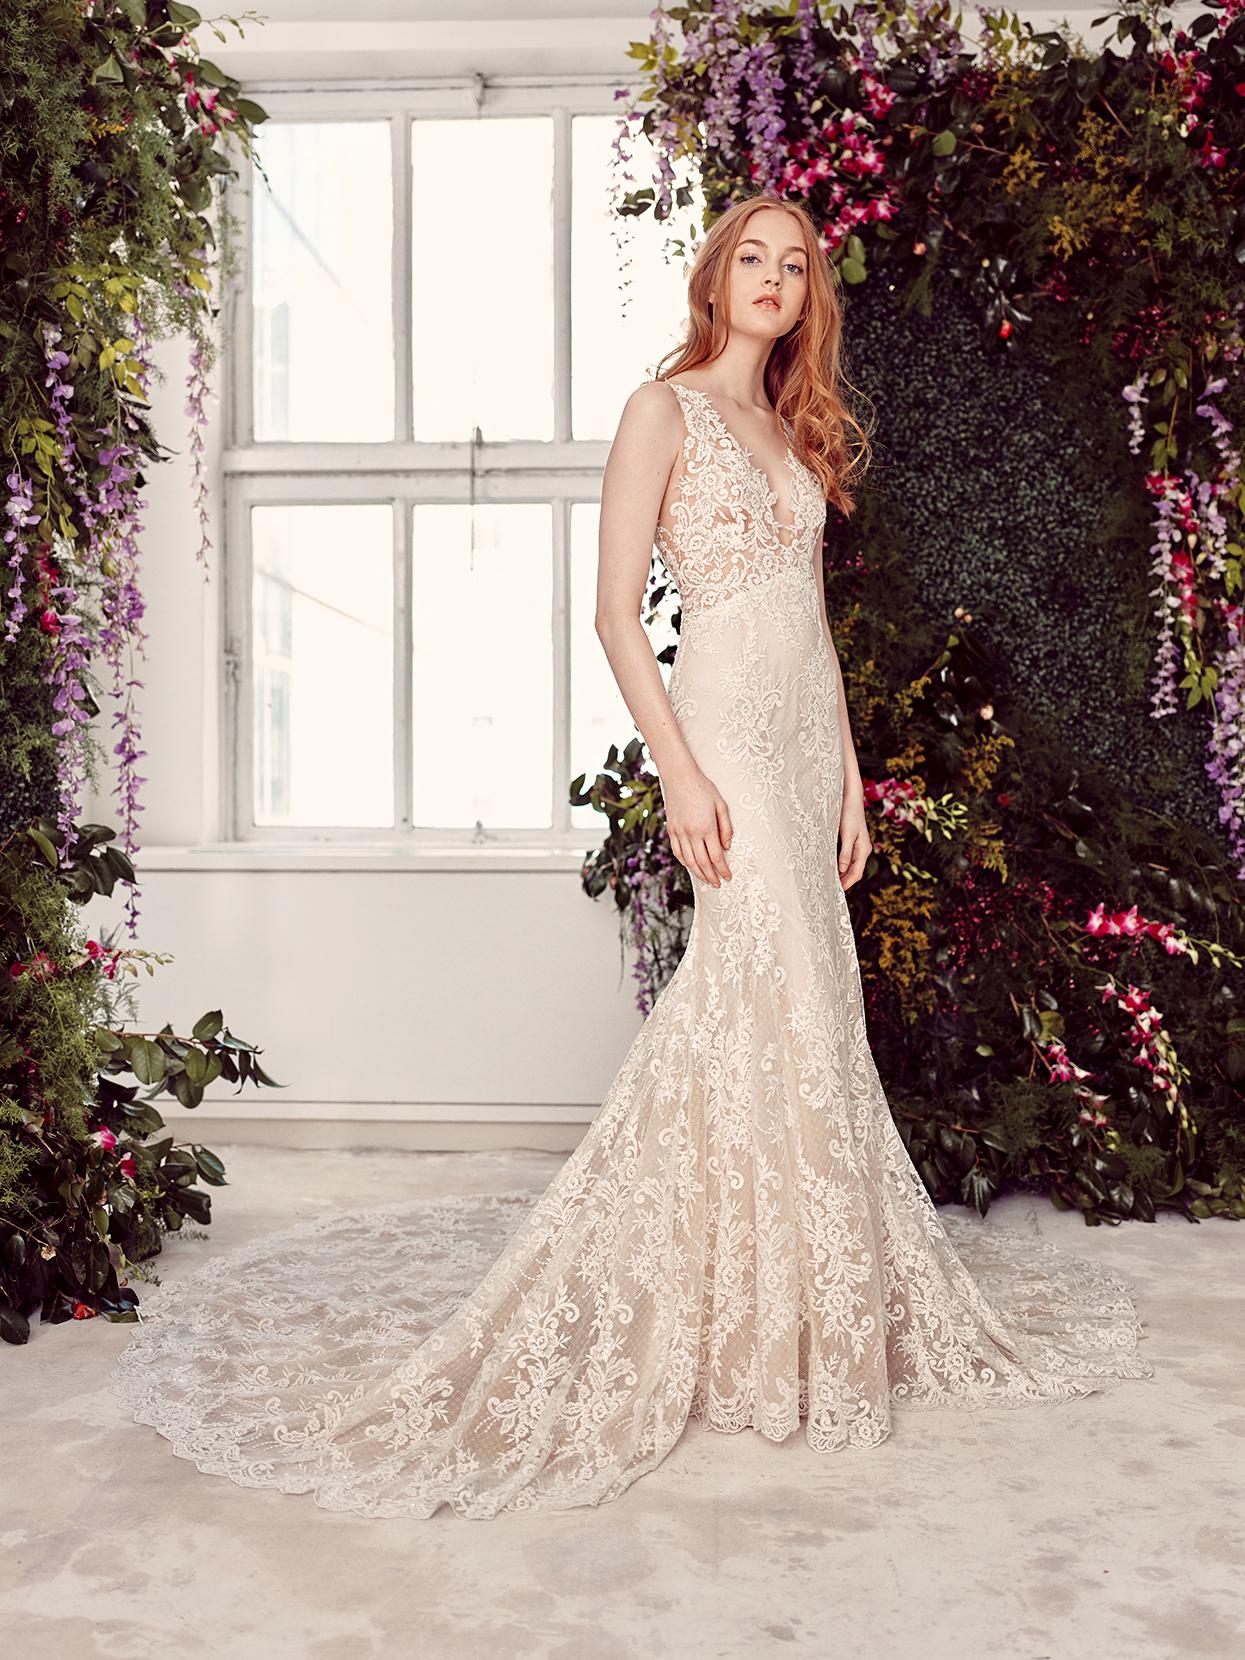 alyne by rita vinieris v-neck lace overlay wedding dress spring 2020